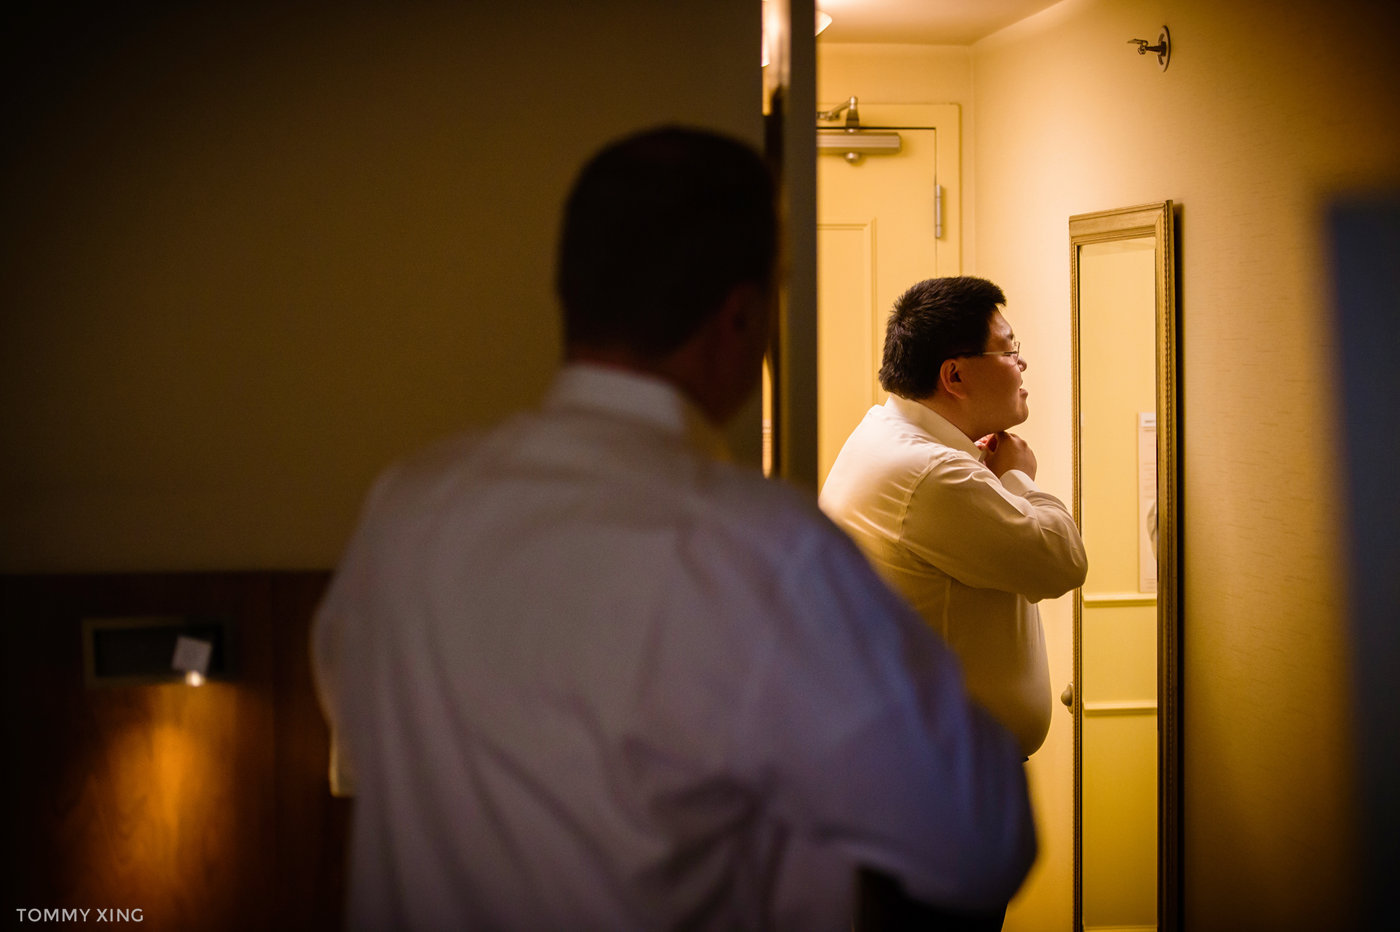 STANFORD MEMORIAL CHURCH WEDDING - Wenjie & Chengcheng - SAN FRANCISCO BAY AREA 斯坦福教堂婚礼跟拍 - 洛杉矶婚礼婚纱照摄影师 Tommy Xing Photography024.jpg